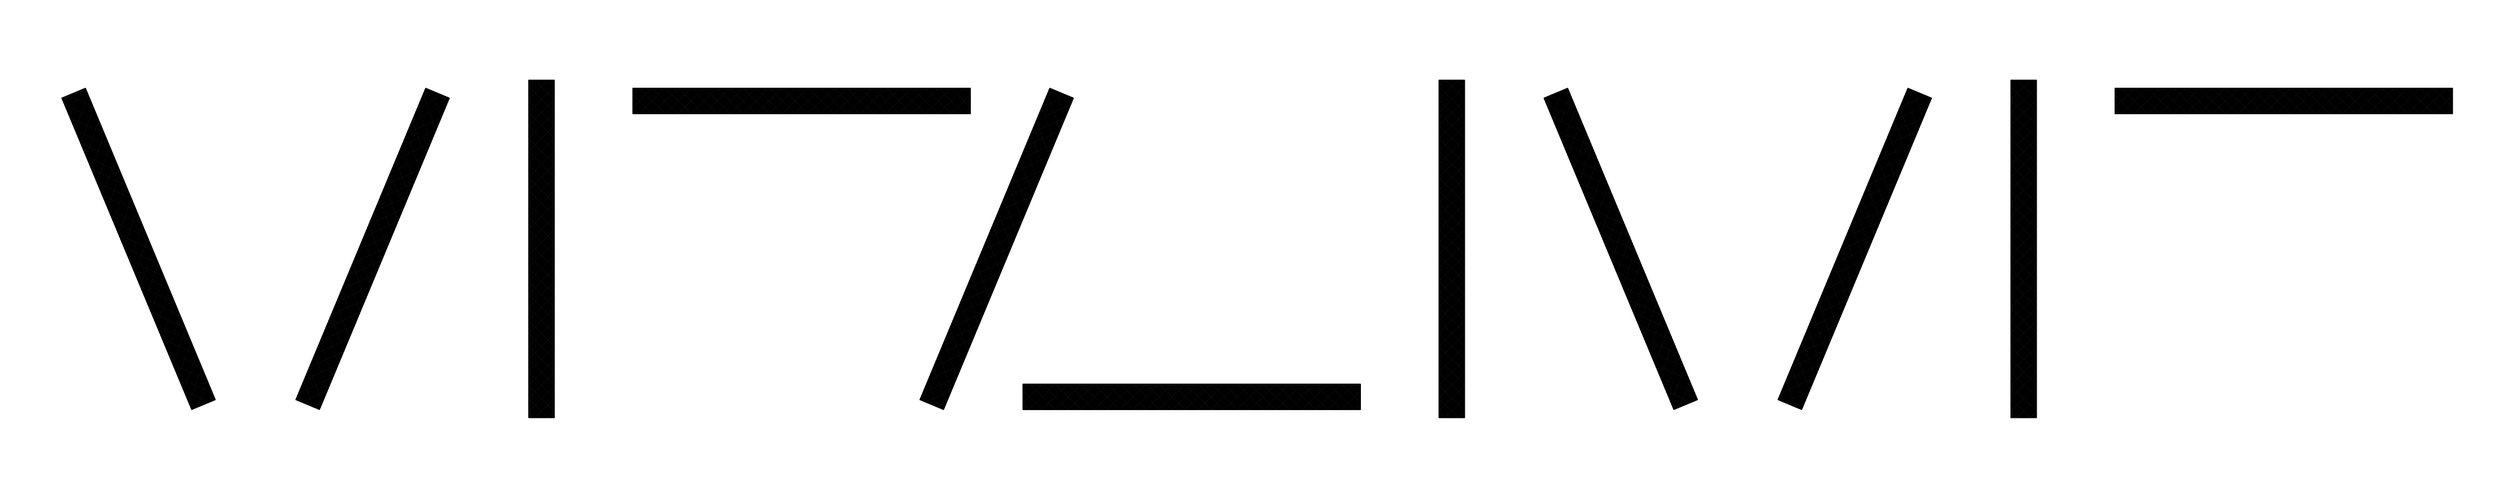 vizivr-logo-start-03_002.jpg